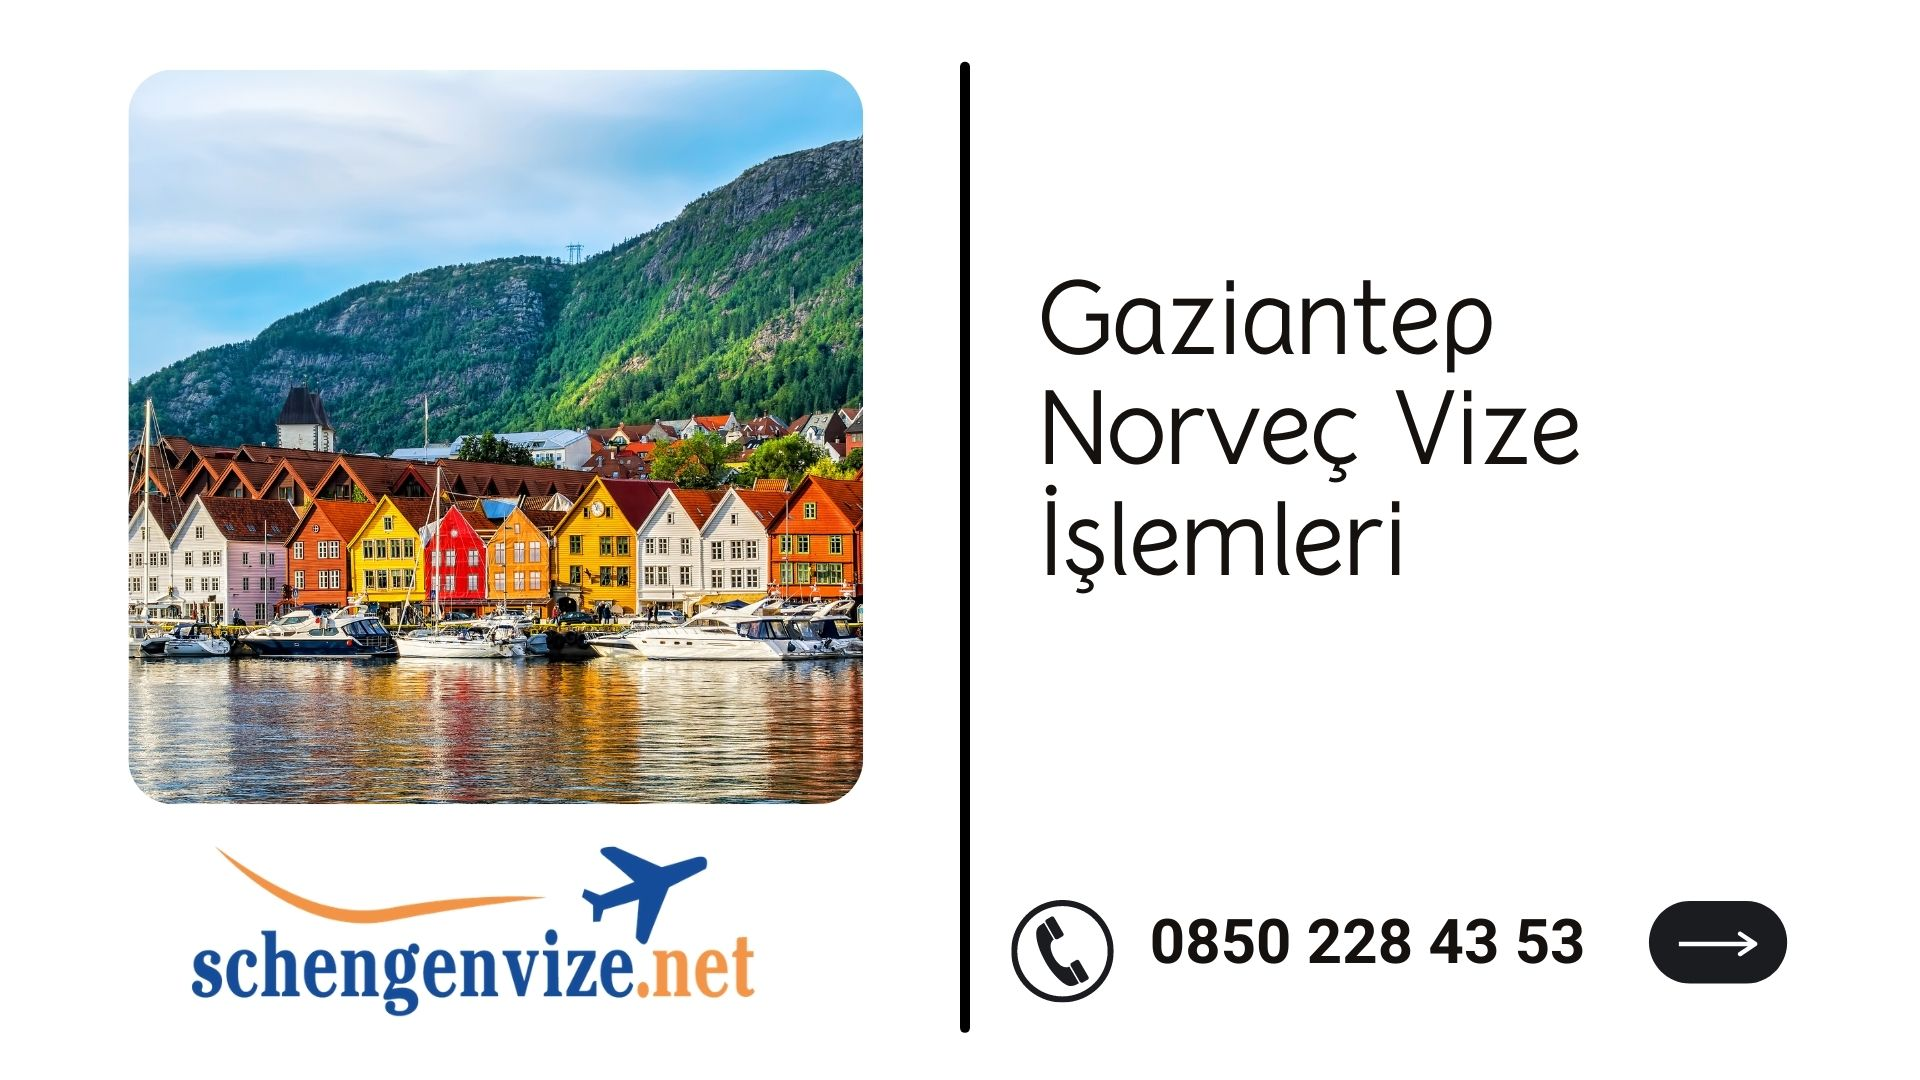 Gaziantep Norveç Vize İşlemleri